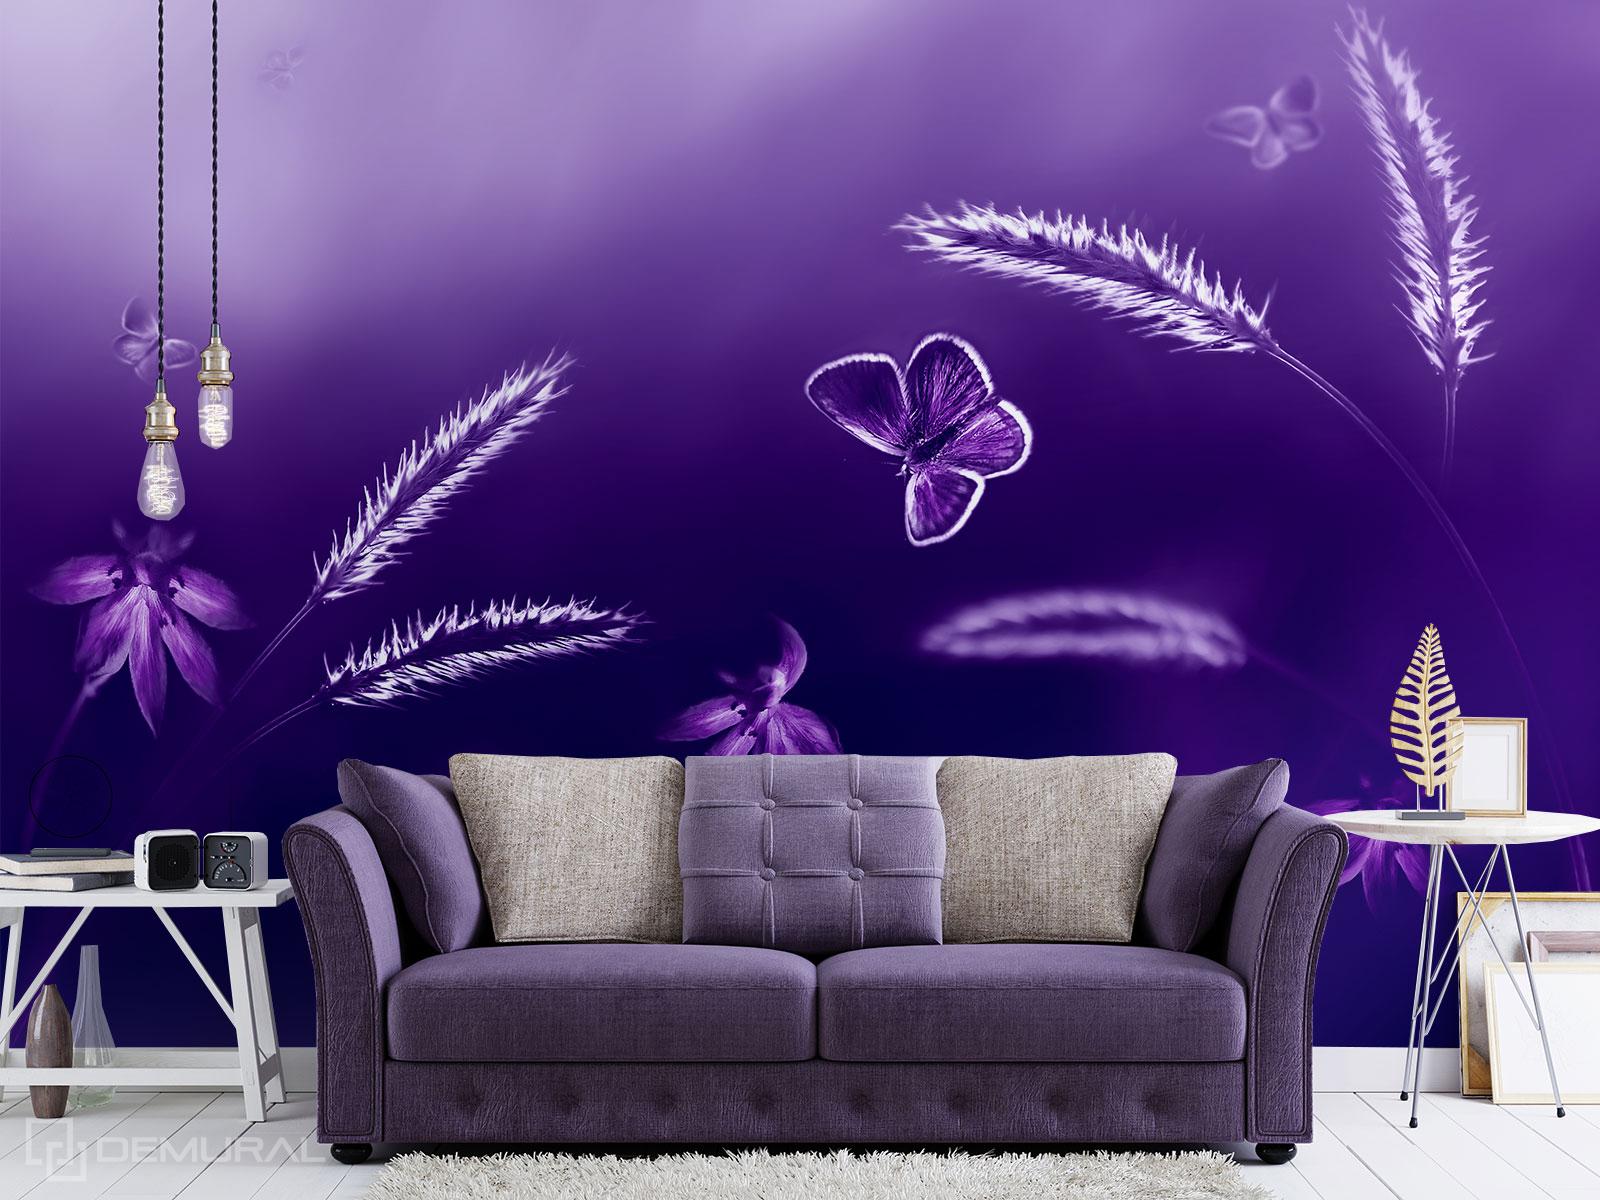 Fototapete Violett Wiese - Ultraviolett Fototapete - Demural